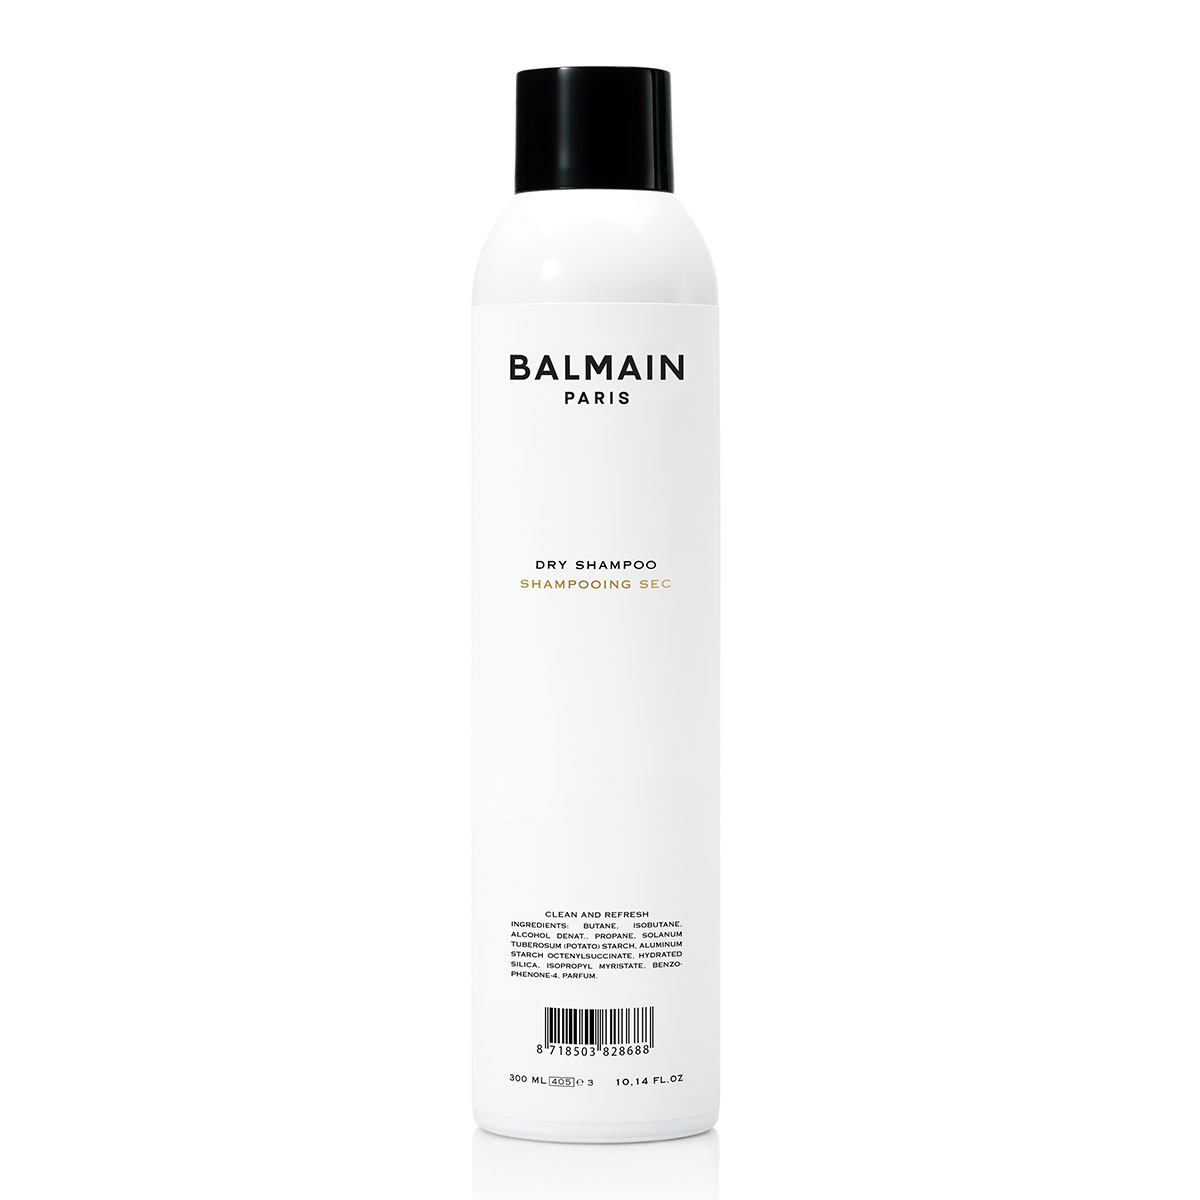 Balmain Dry Shampoo 300ml